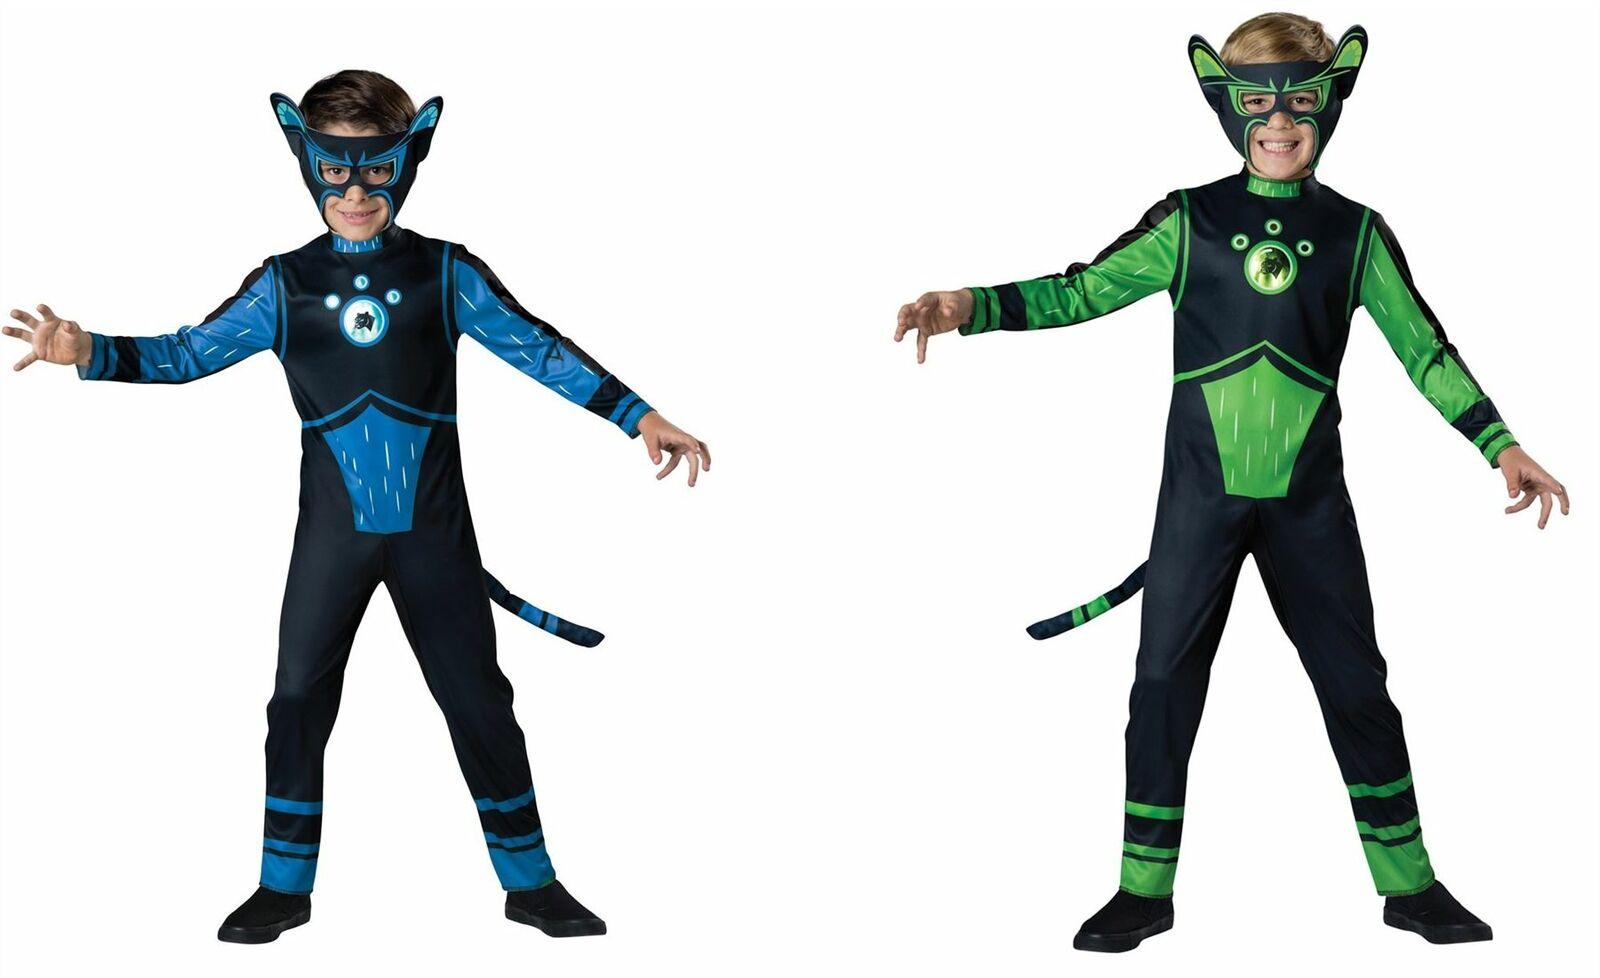 Wild .Kratts Creature Power Suit Costume Kids Halloween Fancy Dress Party 201 bC